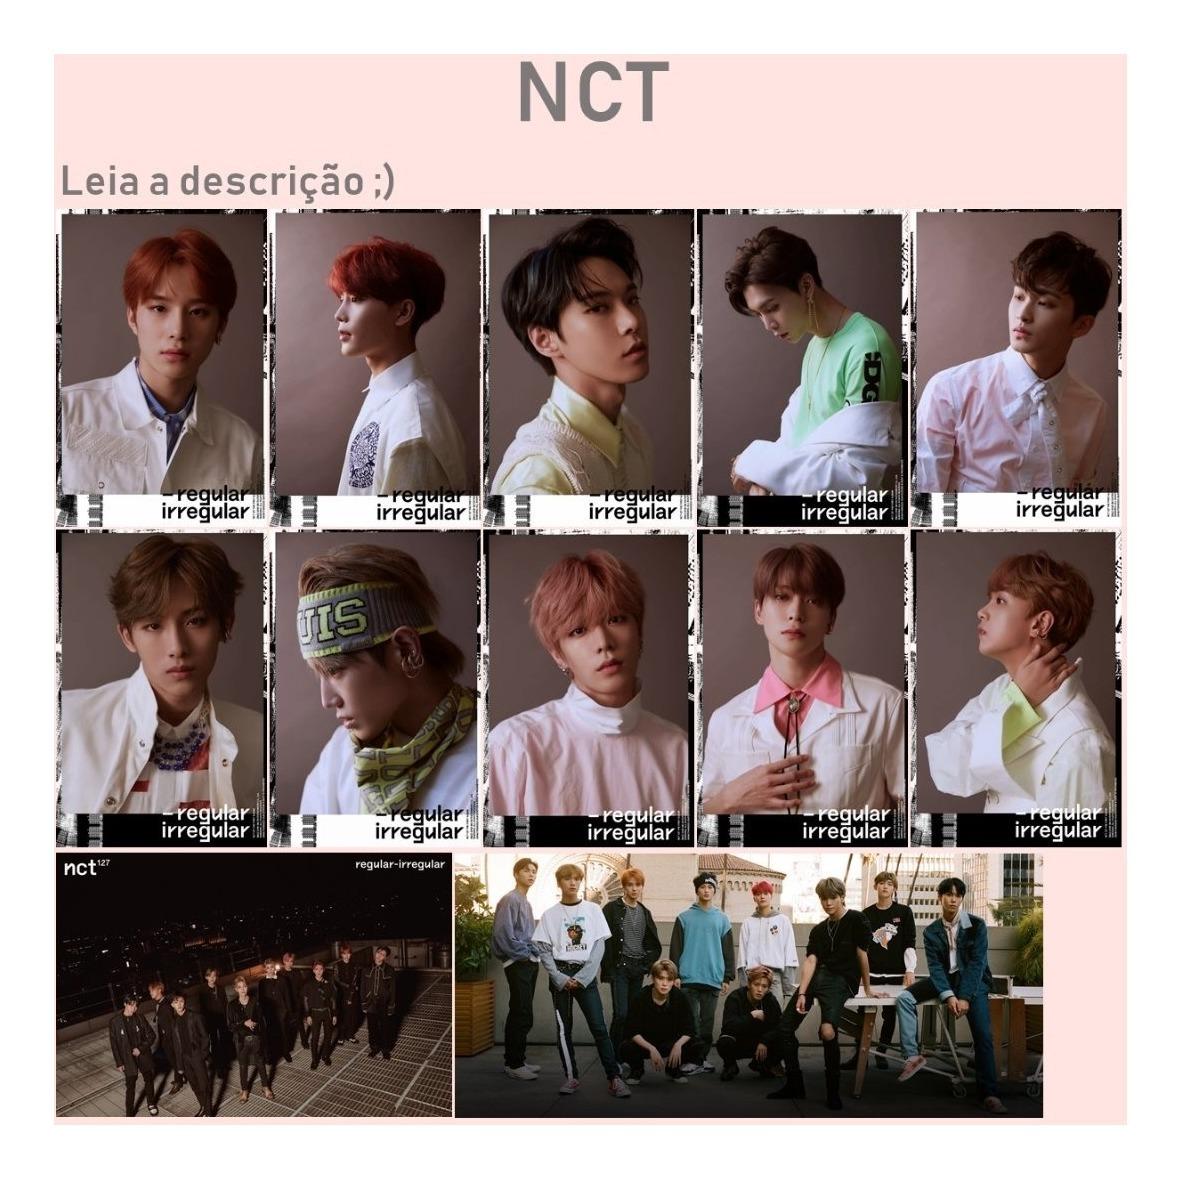 Kpop Nct Regular Irregular - Cards - Photocards - Photocard